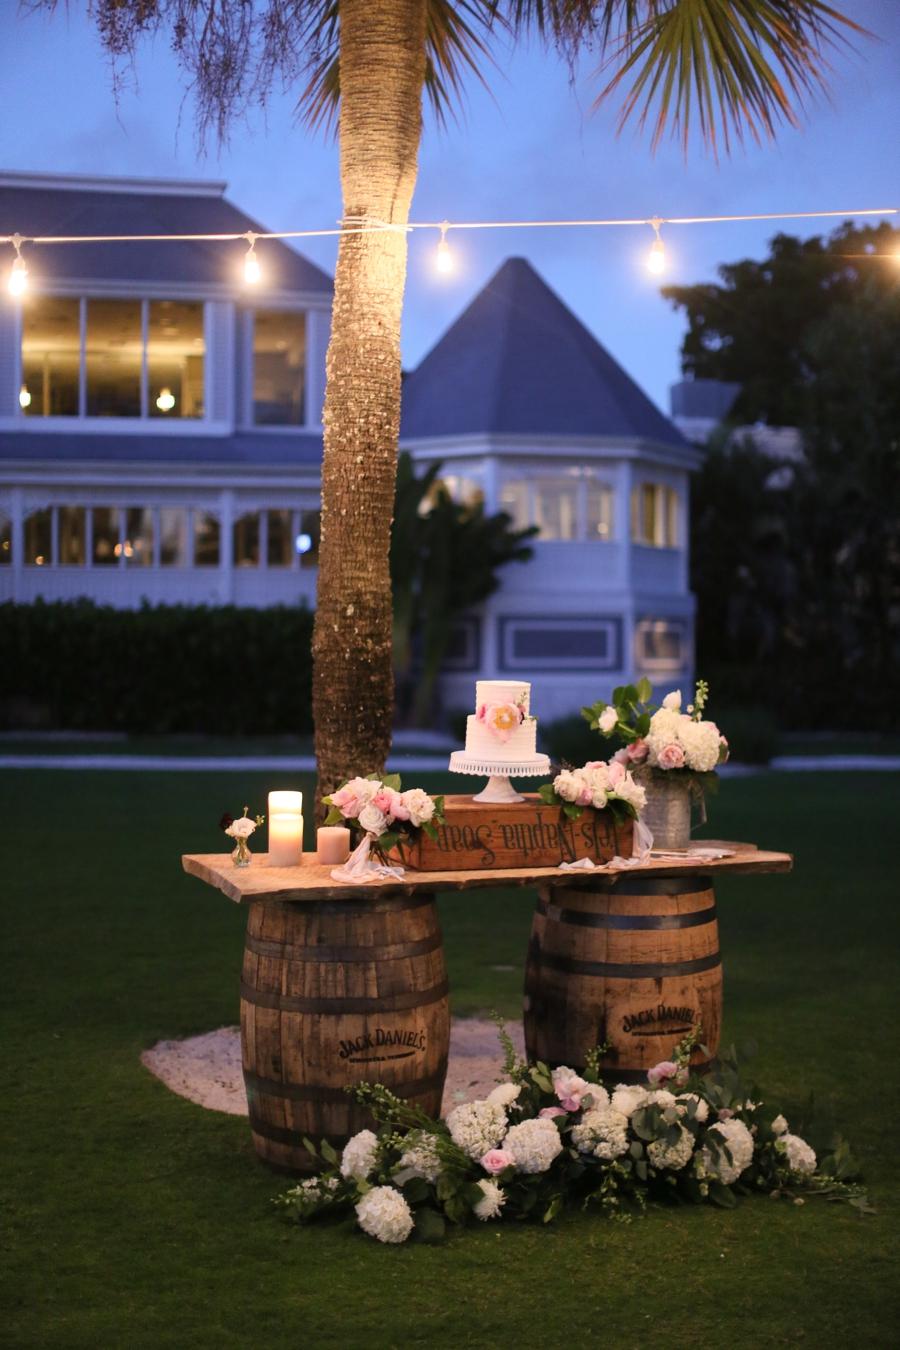 Casa_Ybel_Wedding_ Sanibel_Wedding_Florist_Designer_Planner_1854.jpg